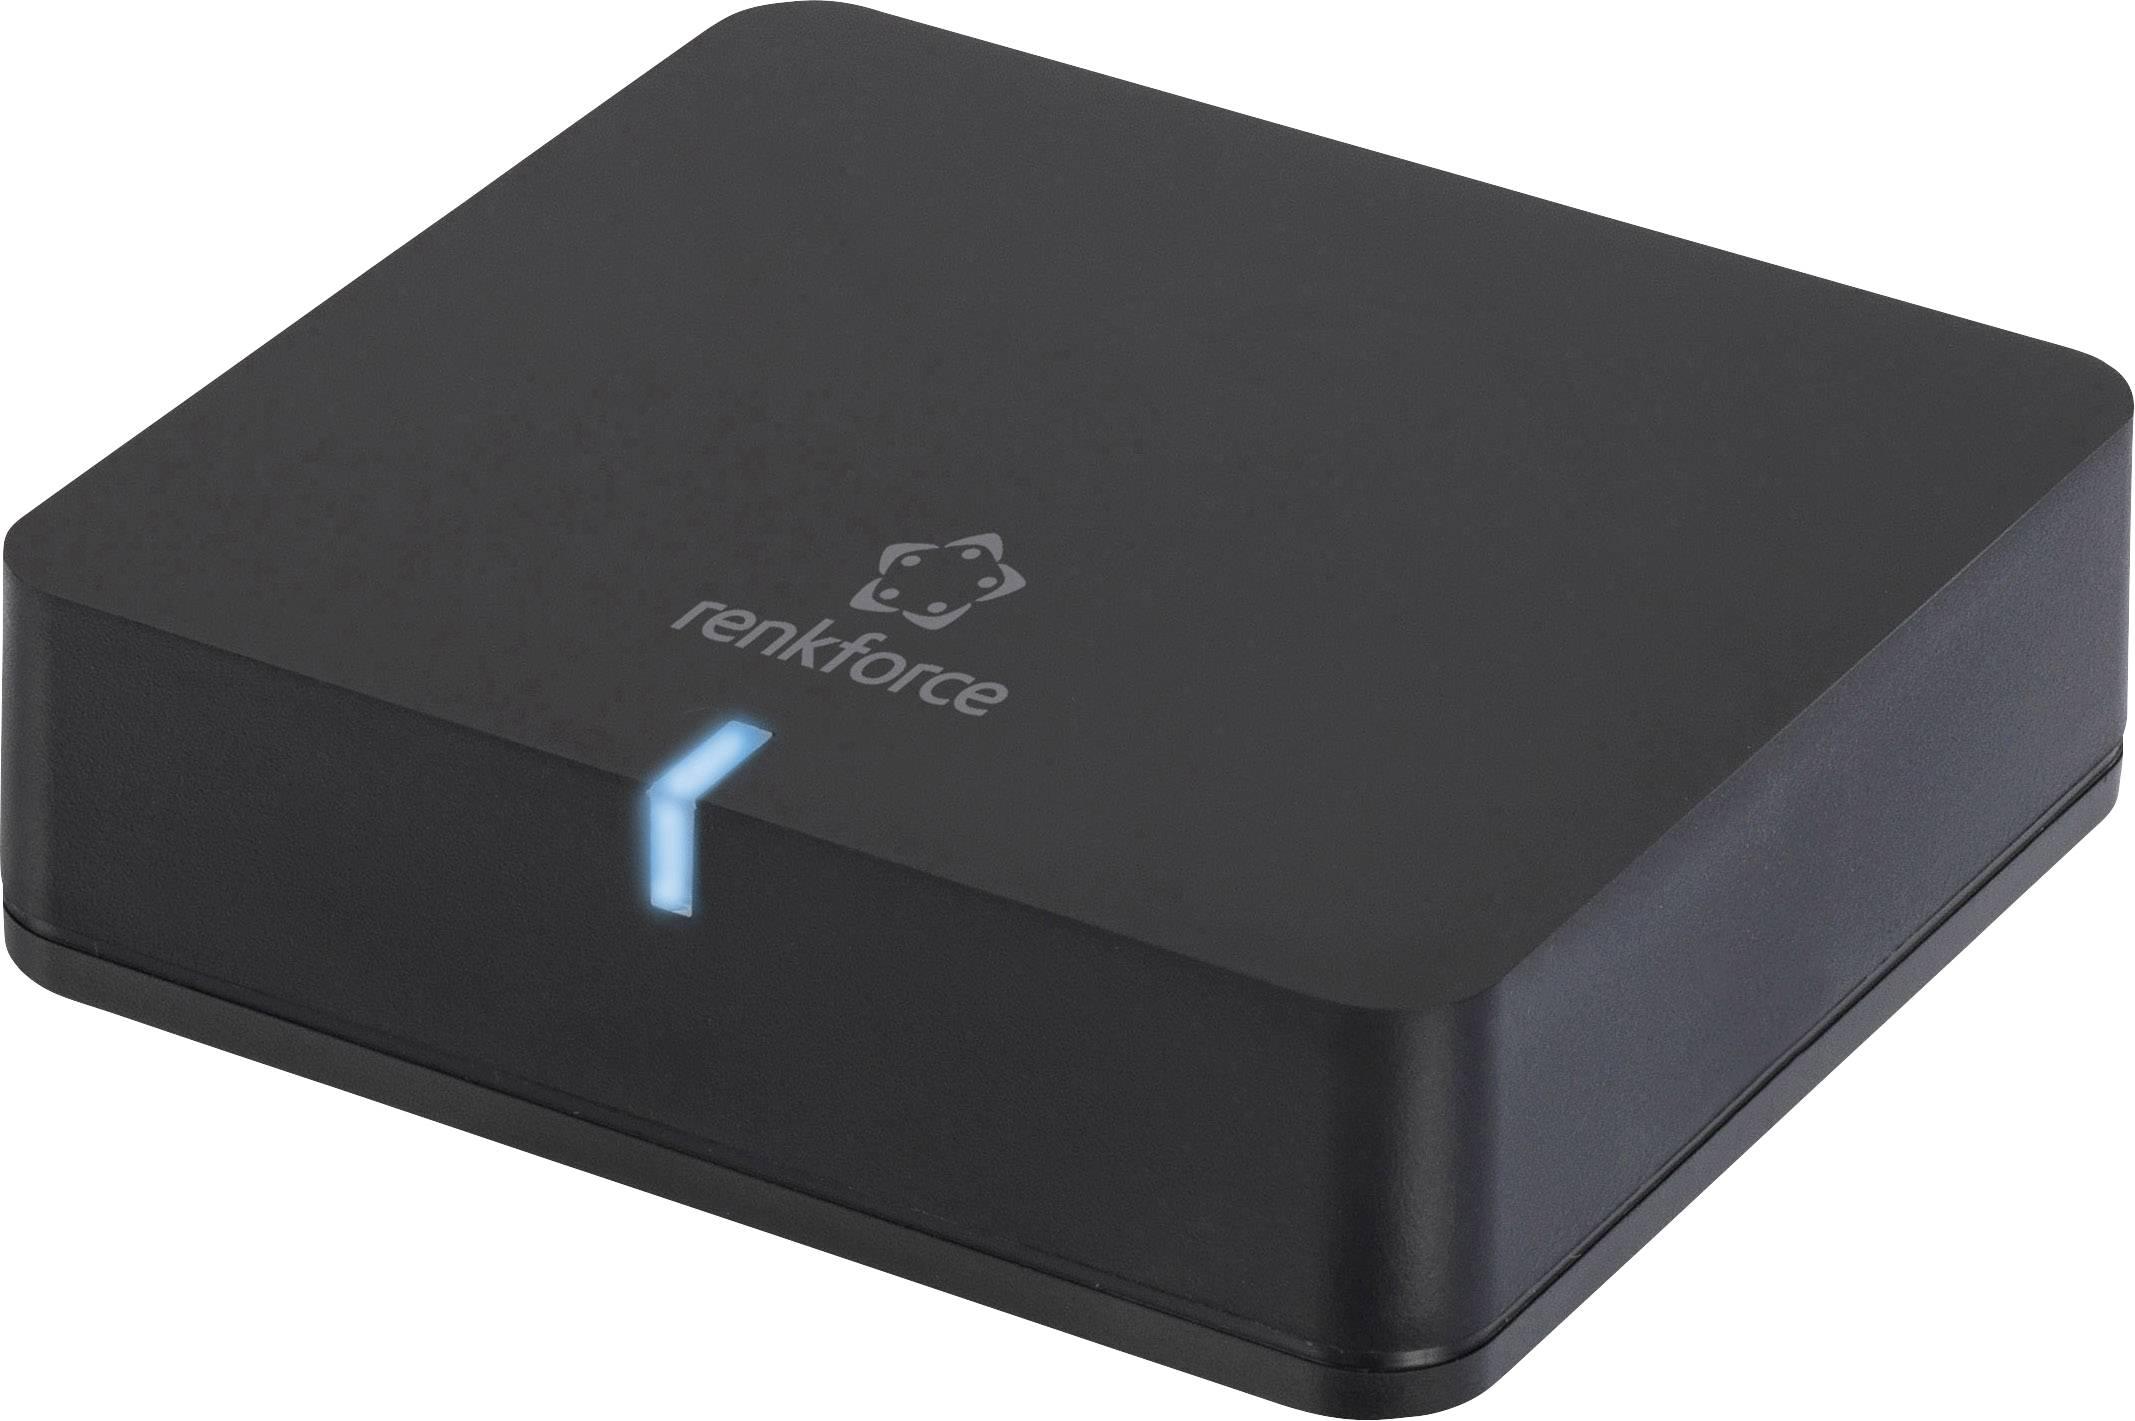 Bezdrôtový audio prijímač Renkforce Bluetooth 3.0